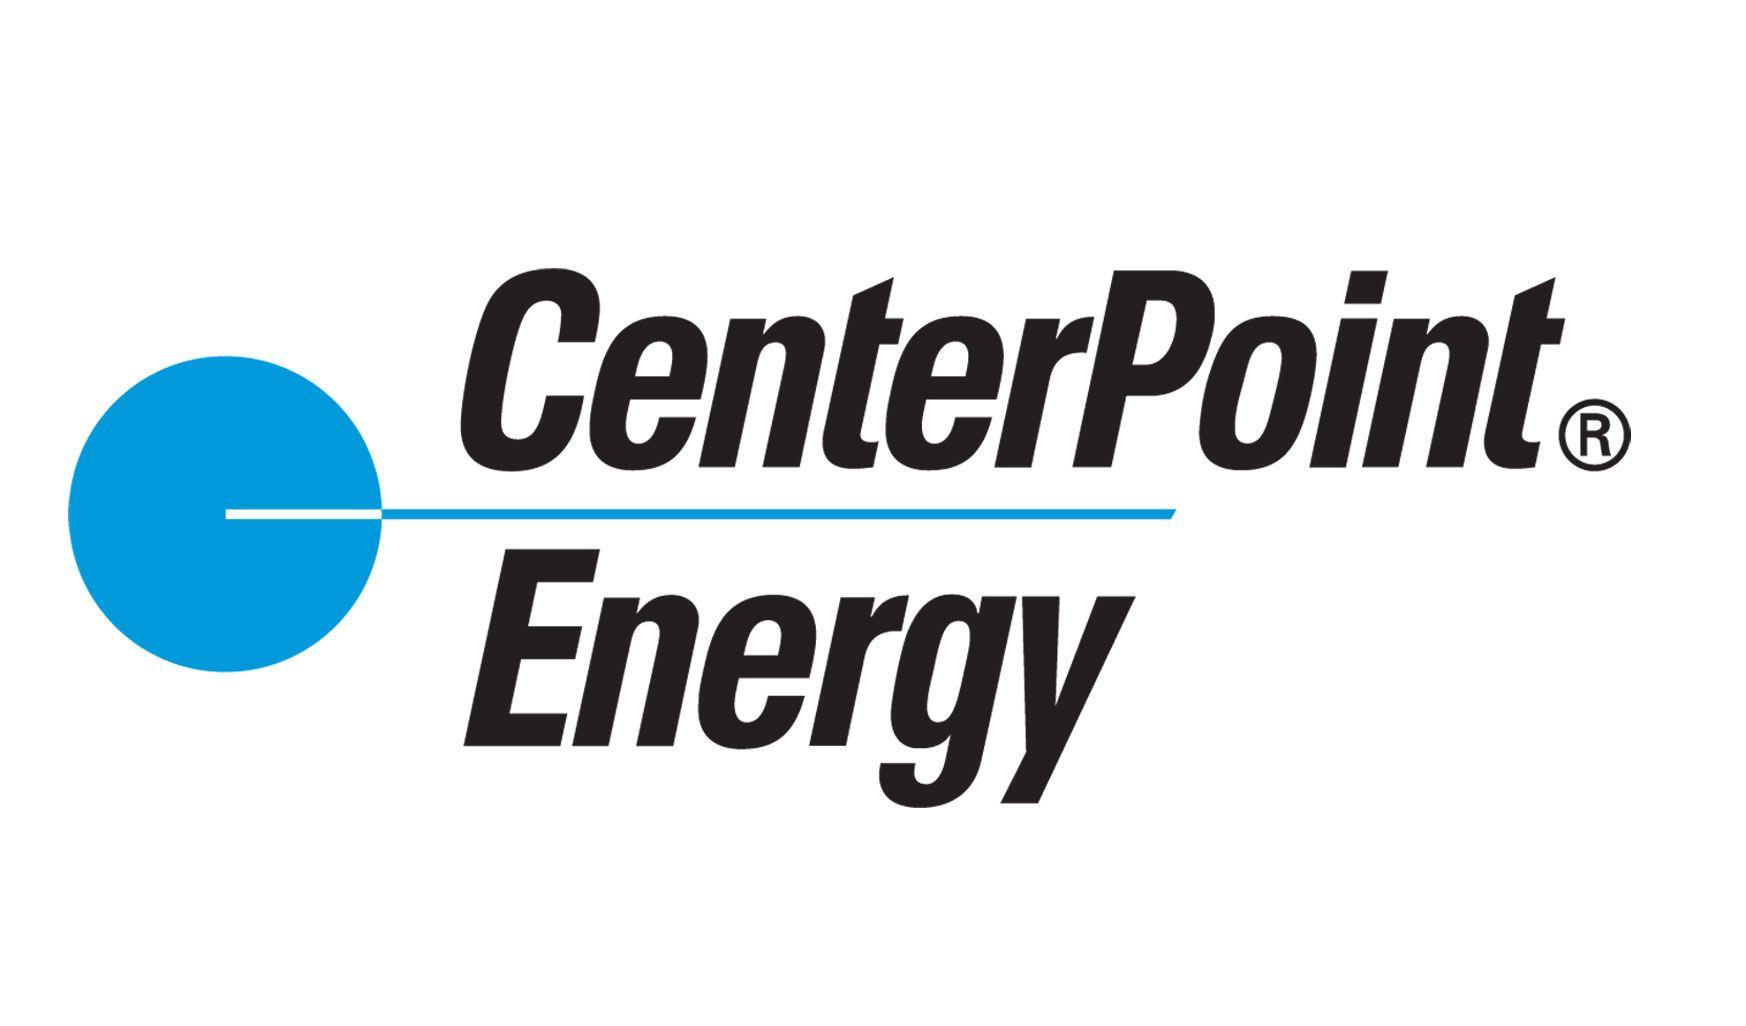 https://www.nawboindy.org/wp-content/uploads/JPEG-CNP-logo-color-002.jpg